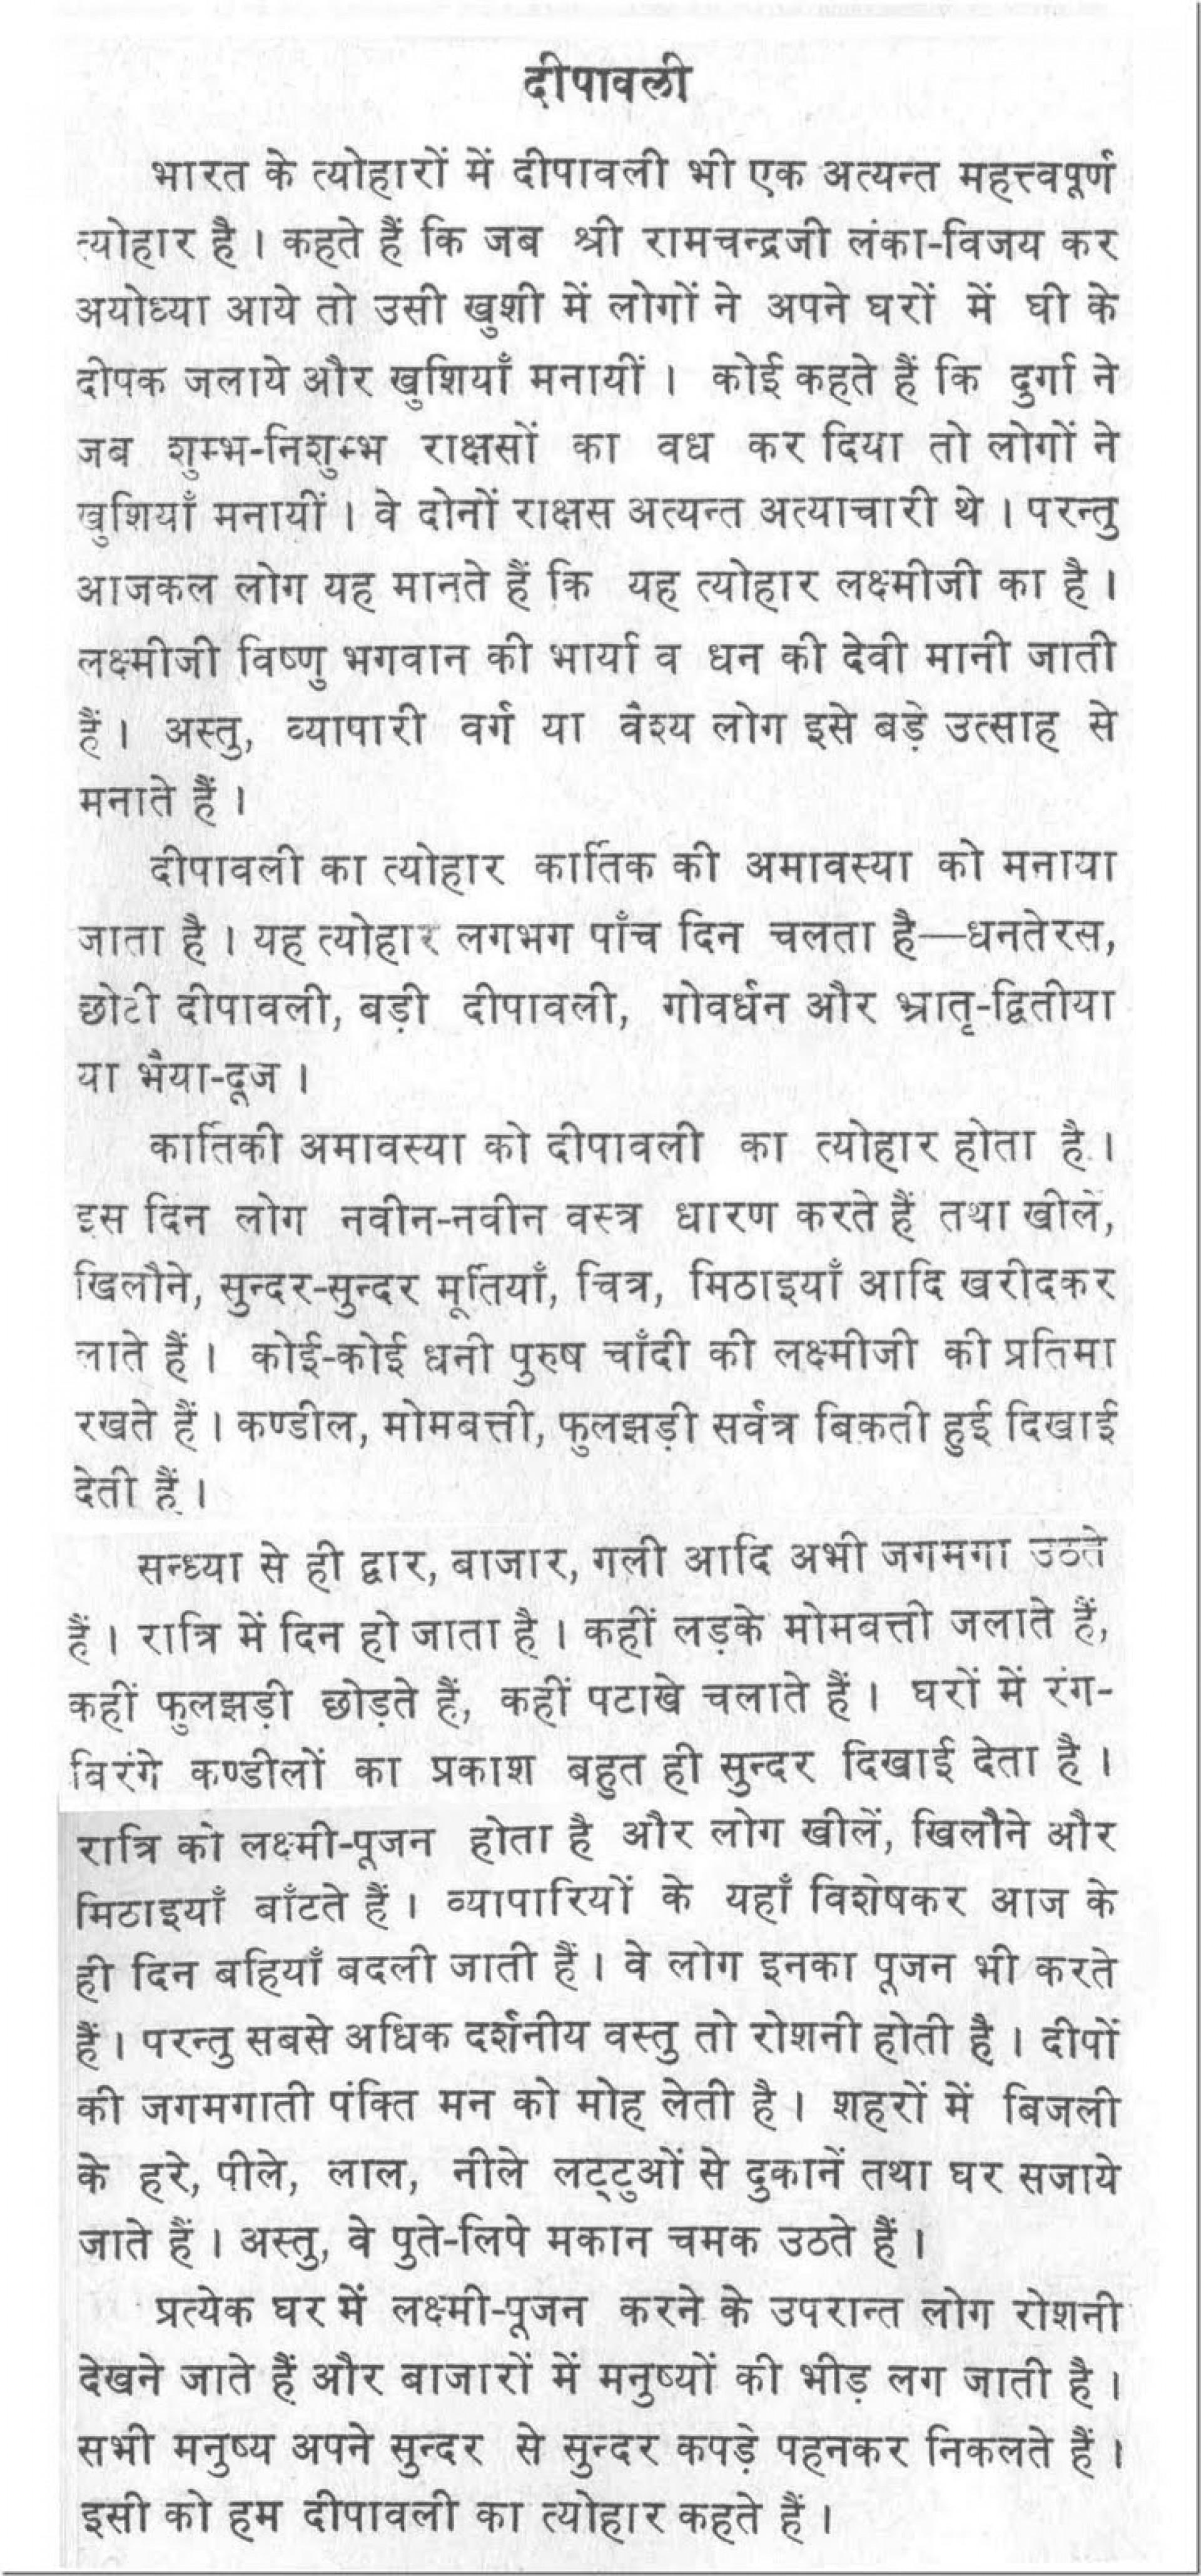 007 Essay Example Diwali20esay20in20hindi Wonderful Esay Easy Prompts Outline Format No Scholarships 2019 1920